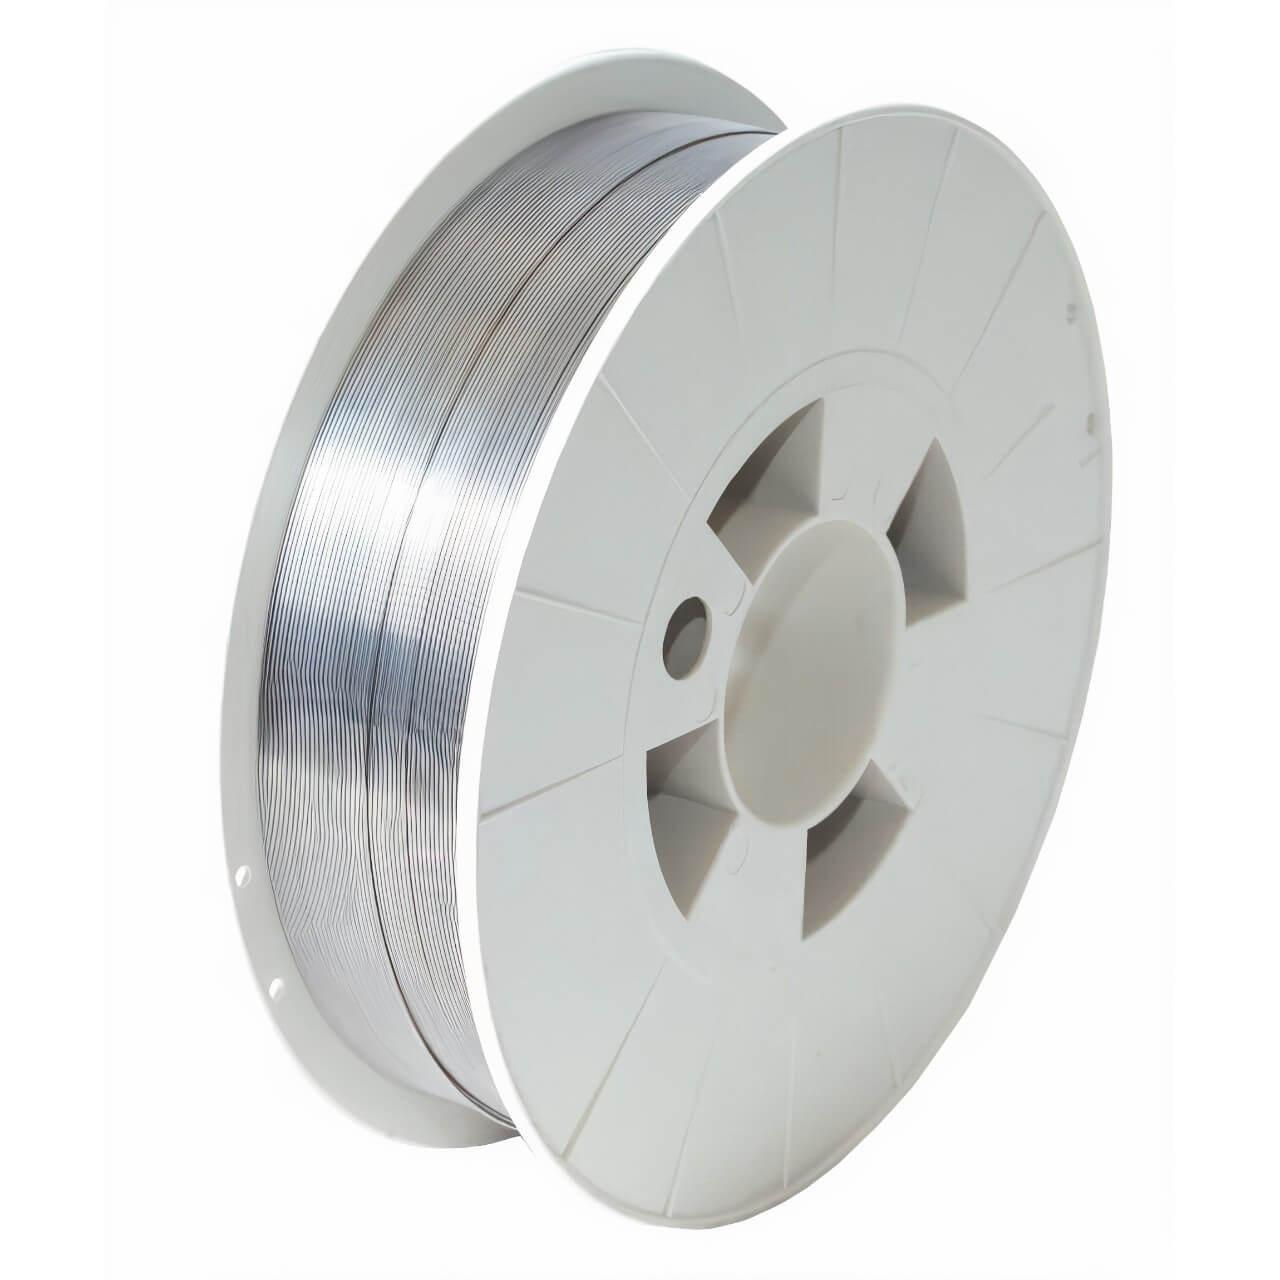 0.9mm Hyundai Supershield 11 Gasless Mig Wire 5kg